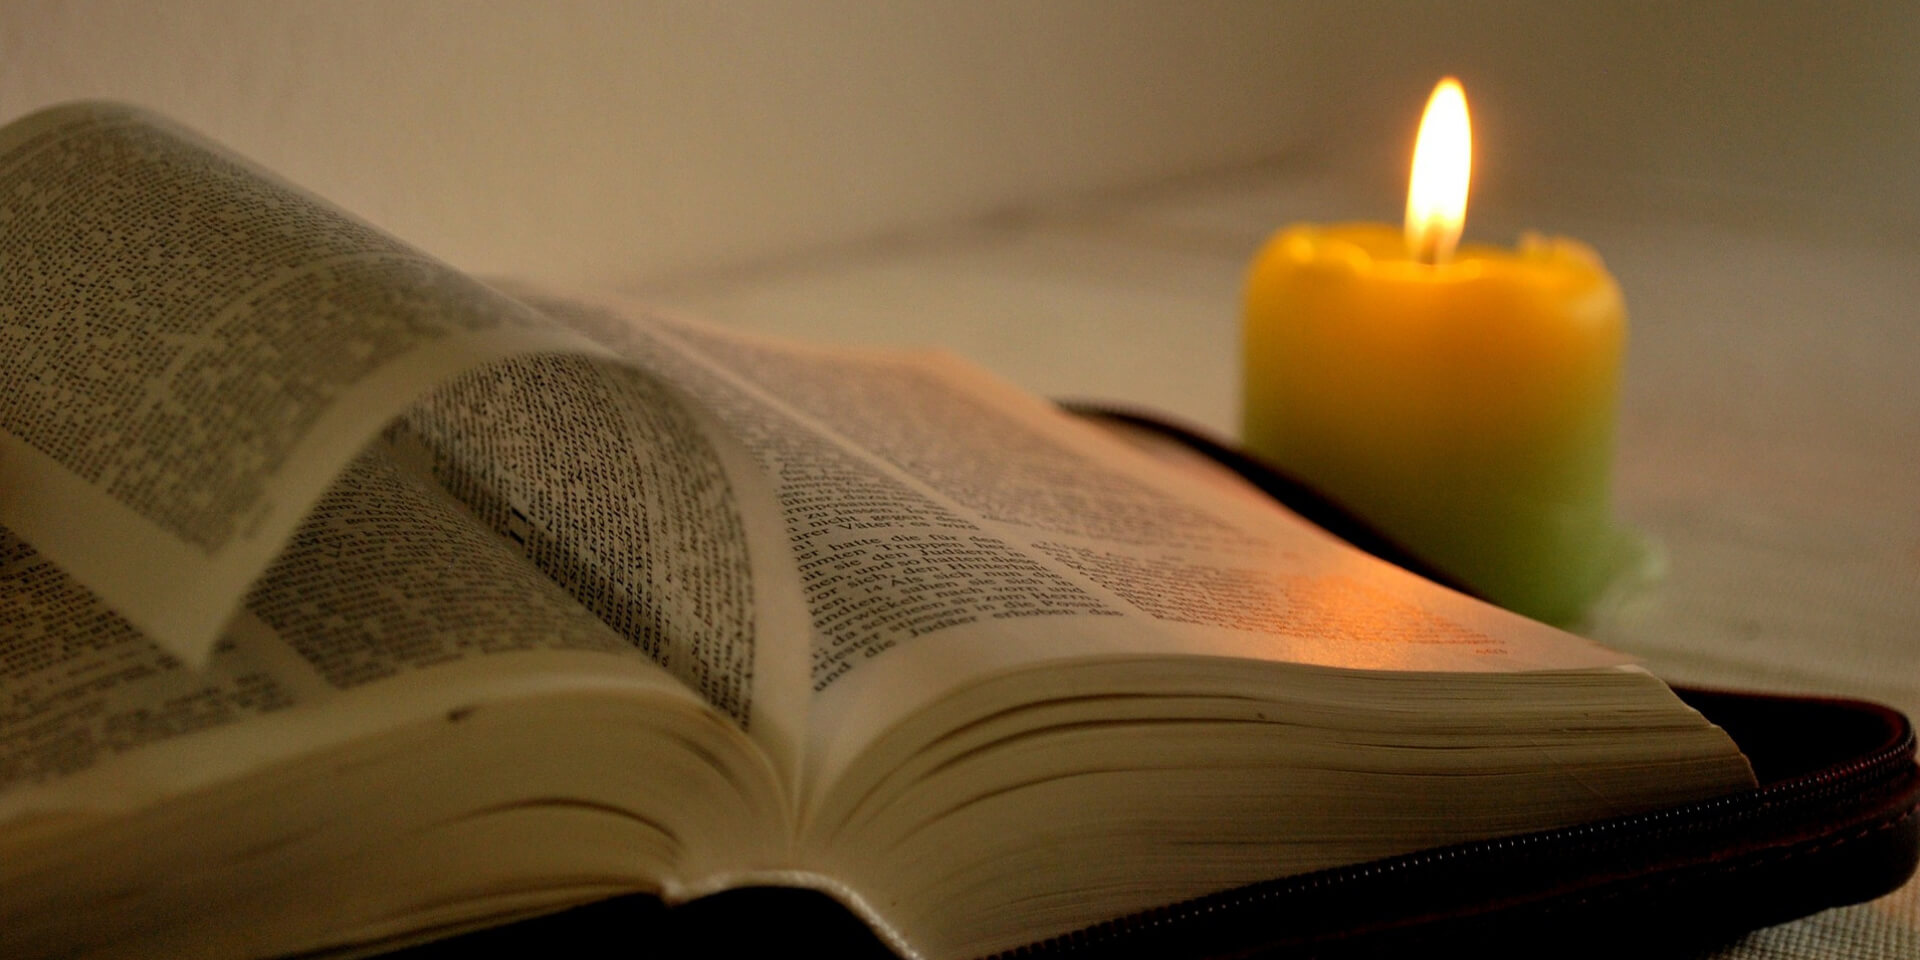 Bibel und Kerze